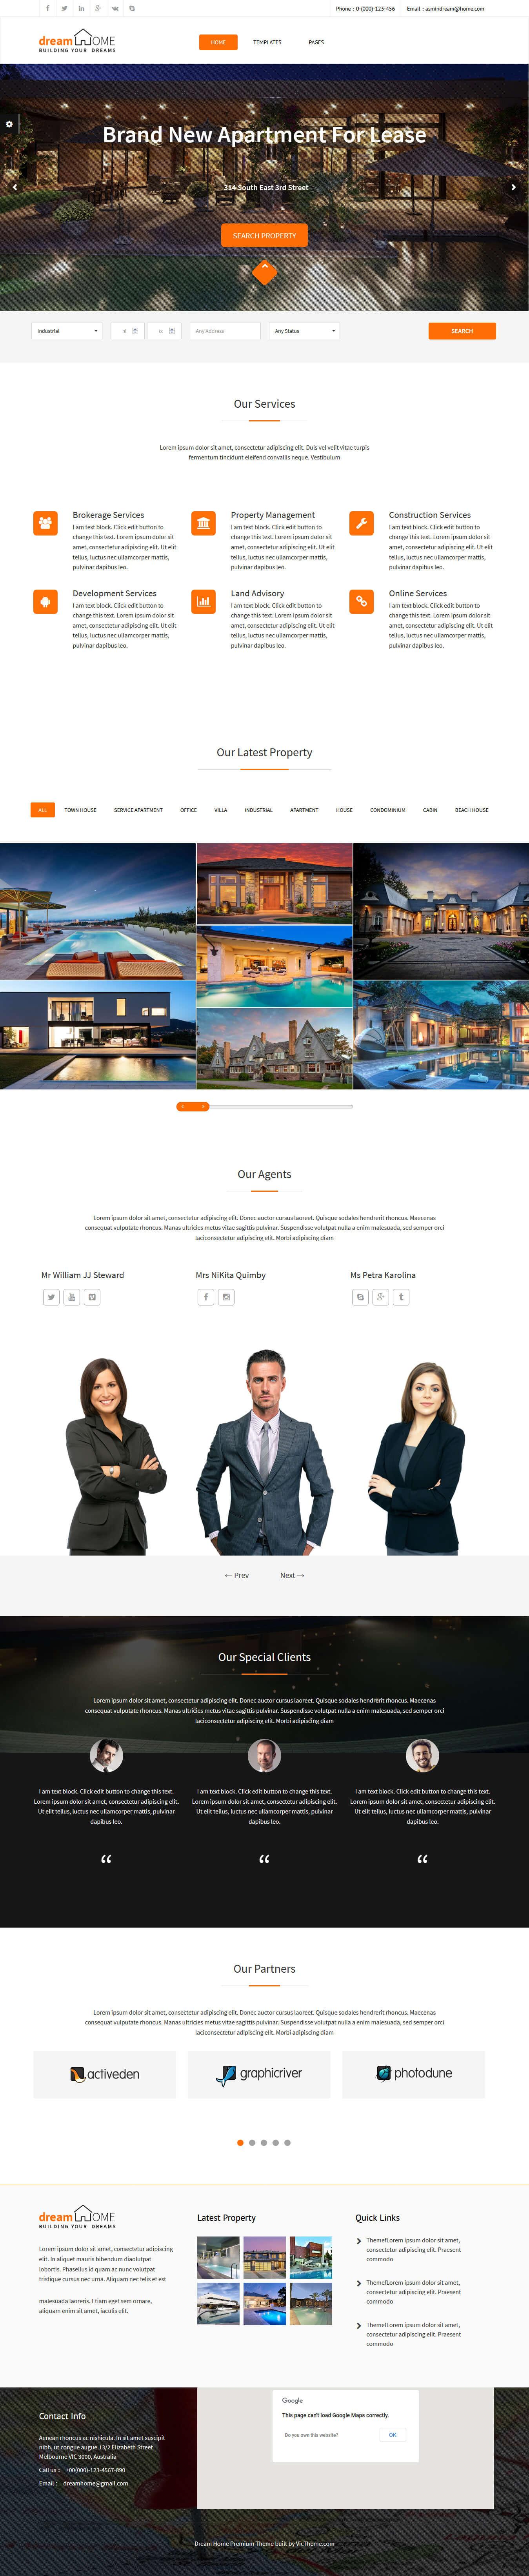 dream home best premium home rental property wordpress theme - 10+ Best Premium Home Rental and Property WordPress Themes